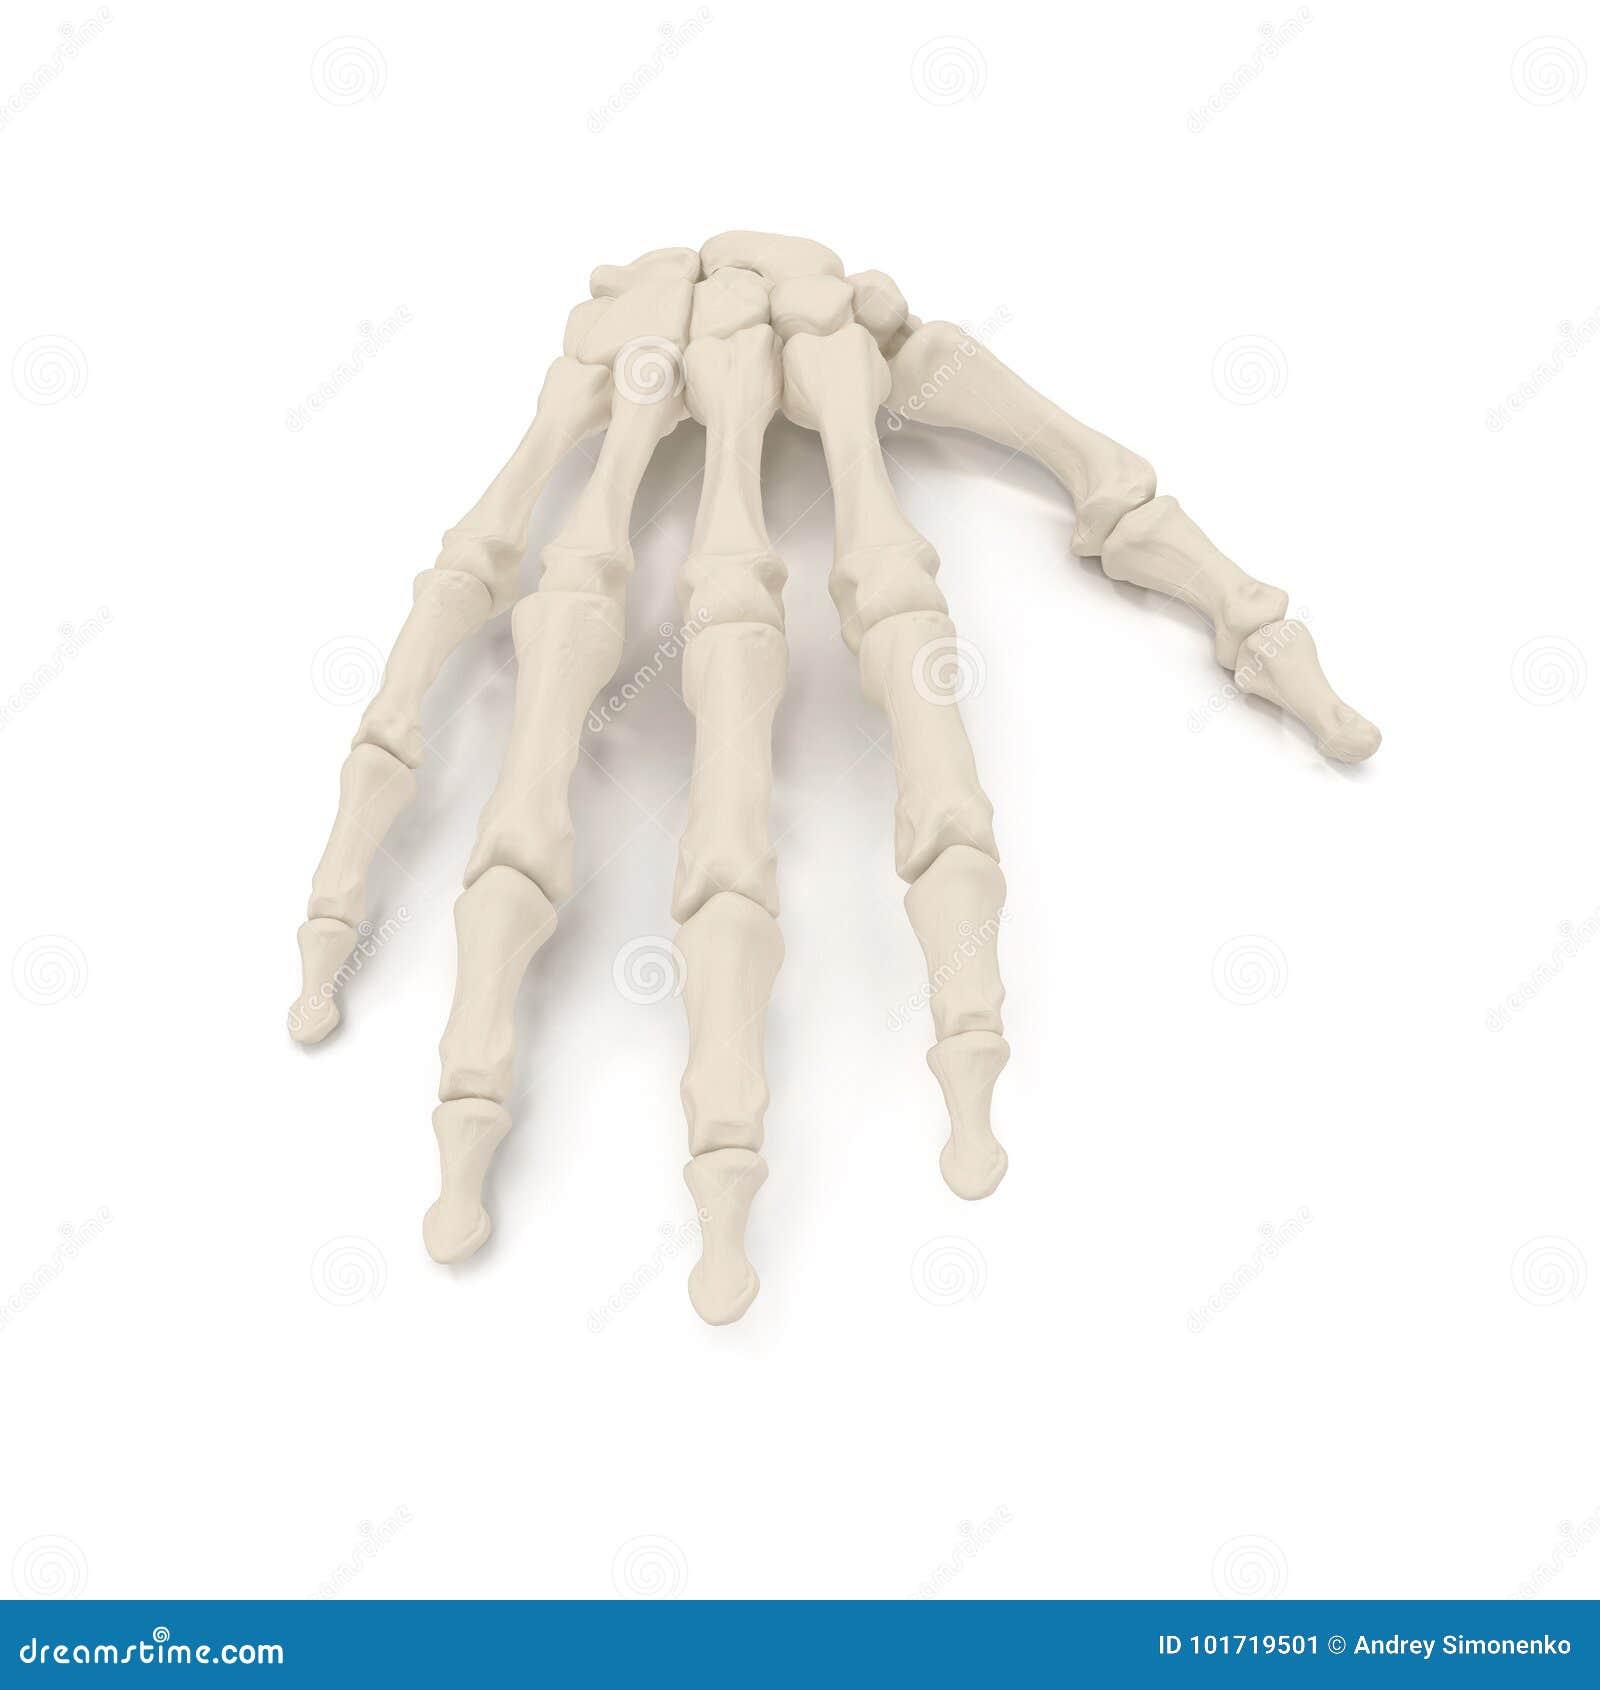 Human Arm Bones On White 3d Illustration Stock Illustration